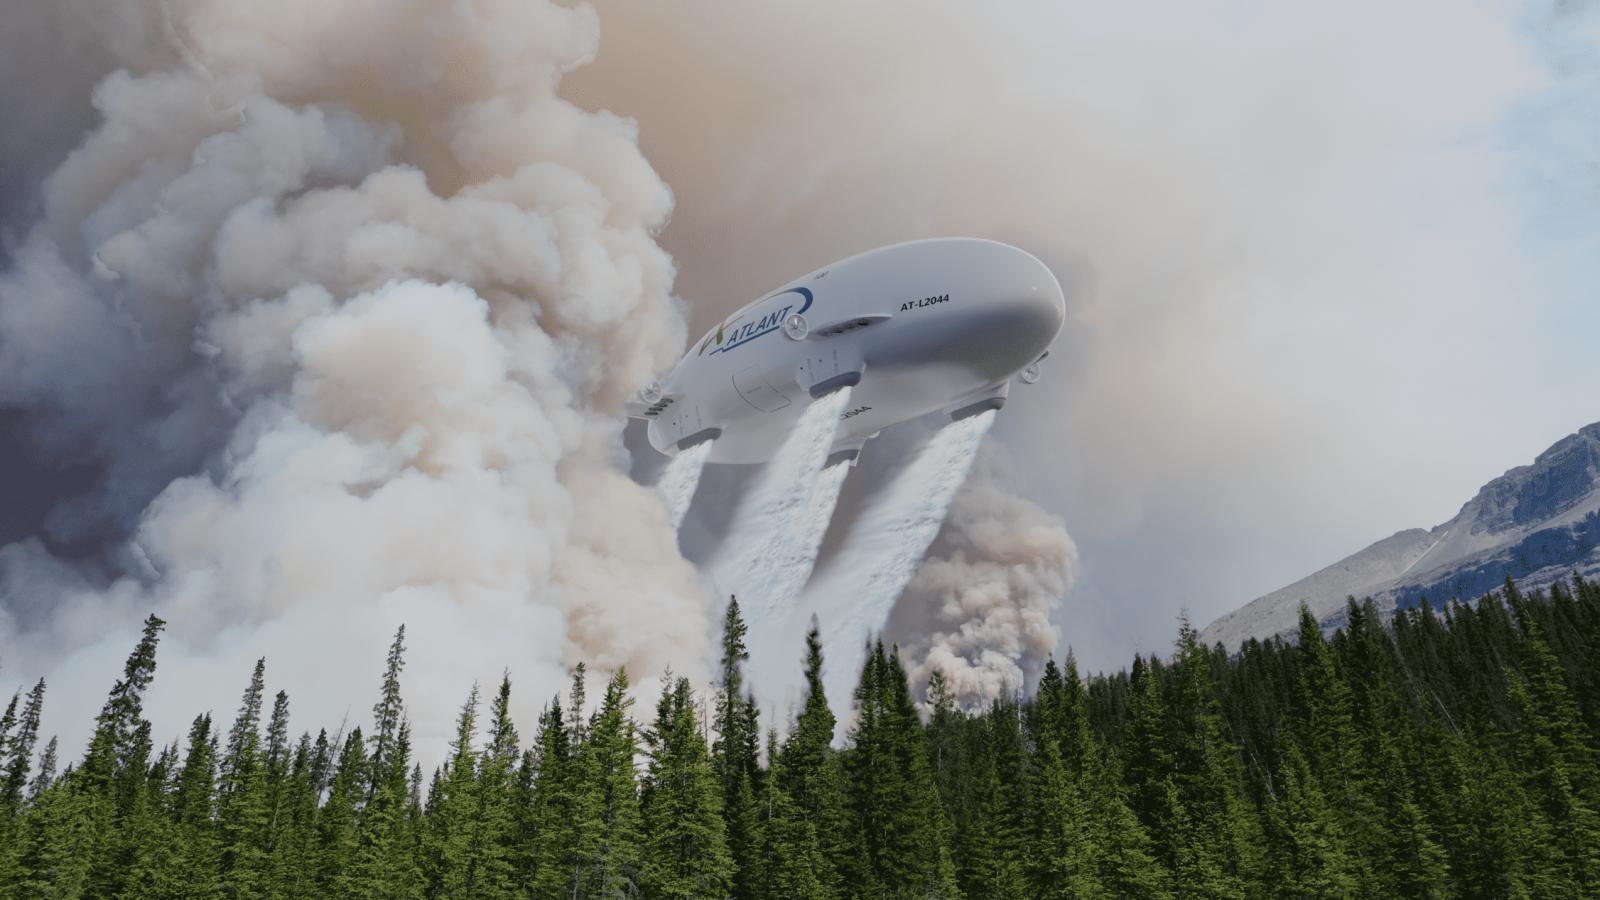 Atlas LTA atlant 100 fire forest ooptimized